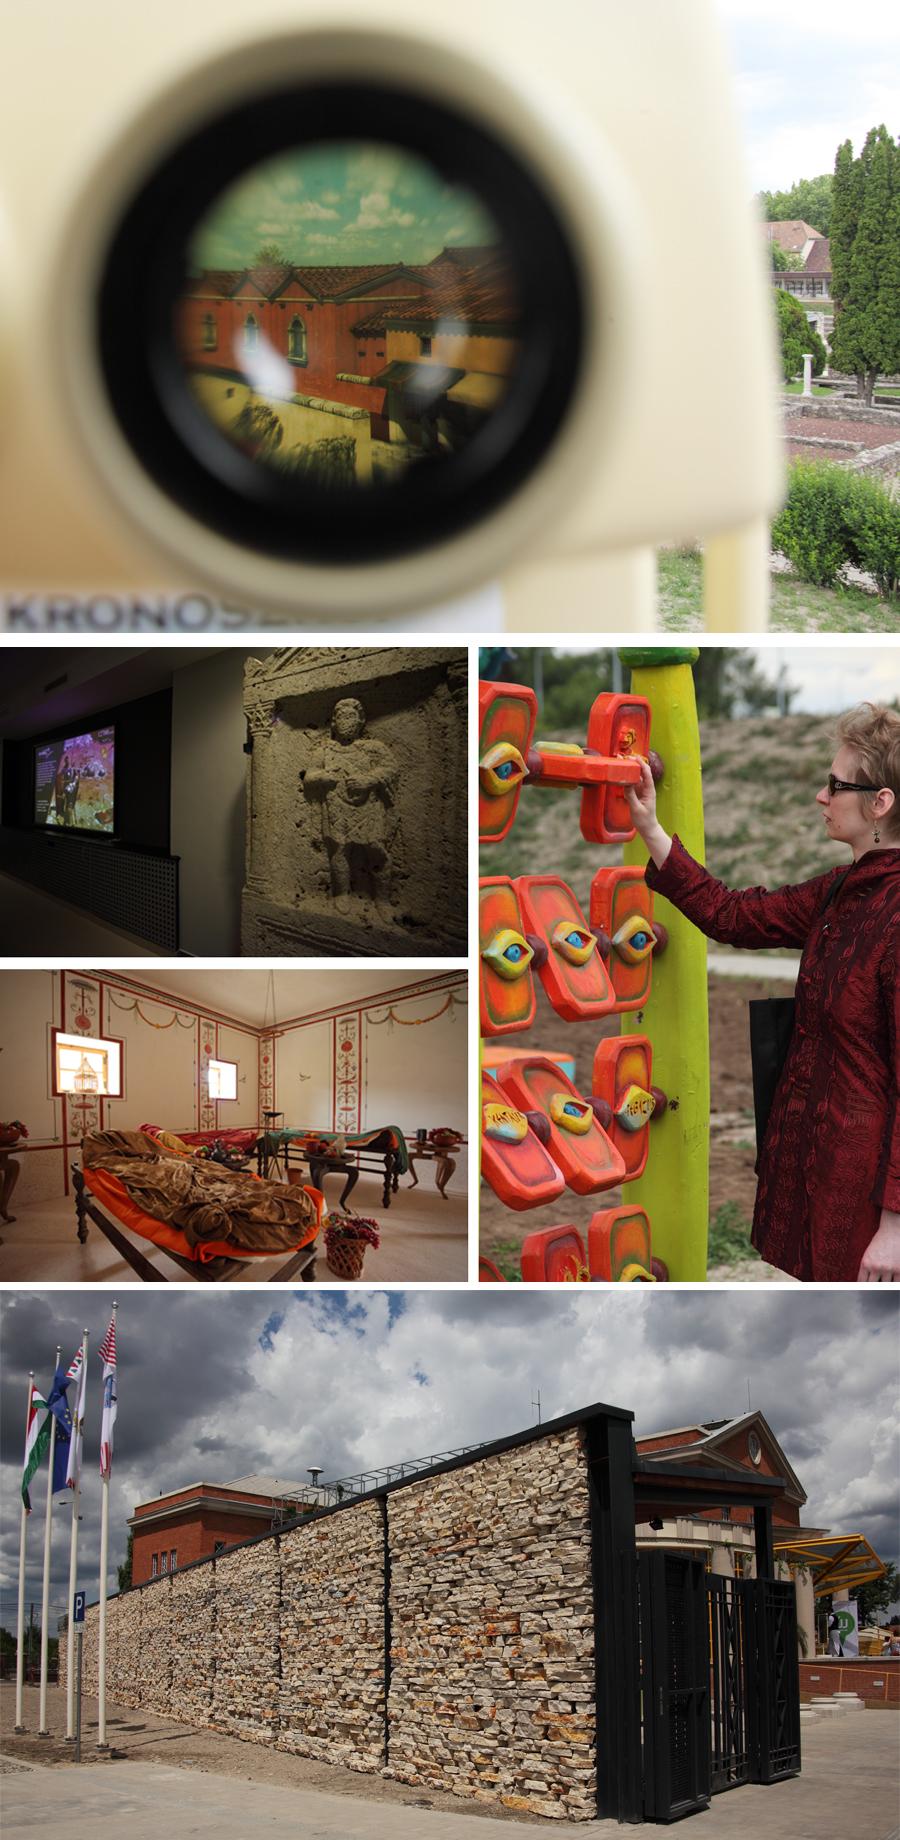 http://www.muemlekem.hu/images/magazin/20120615aquincum/03.jpg